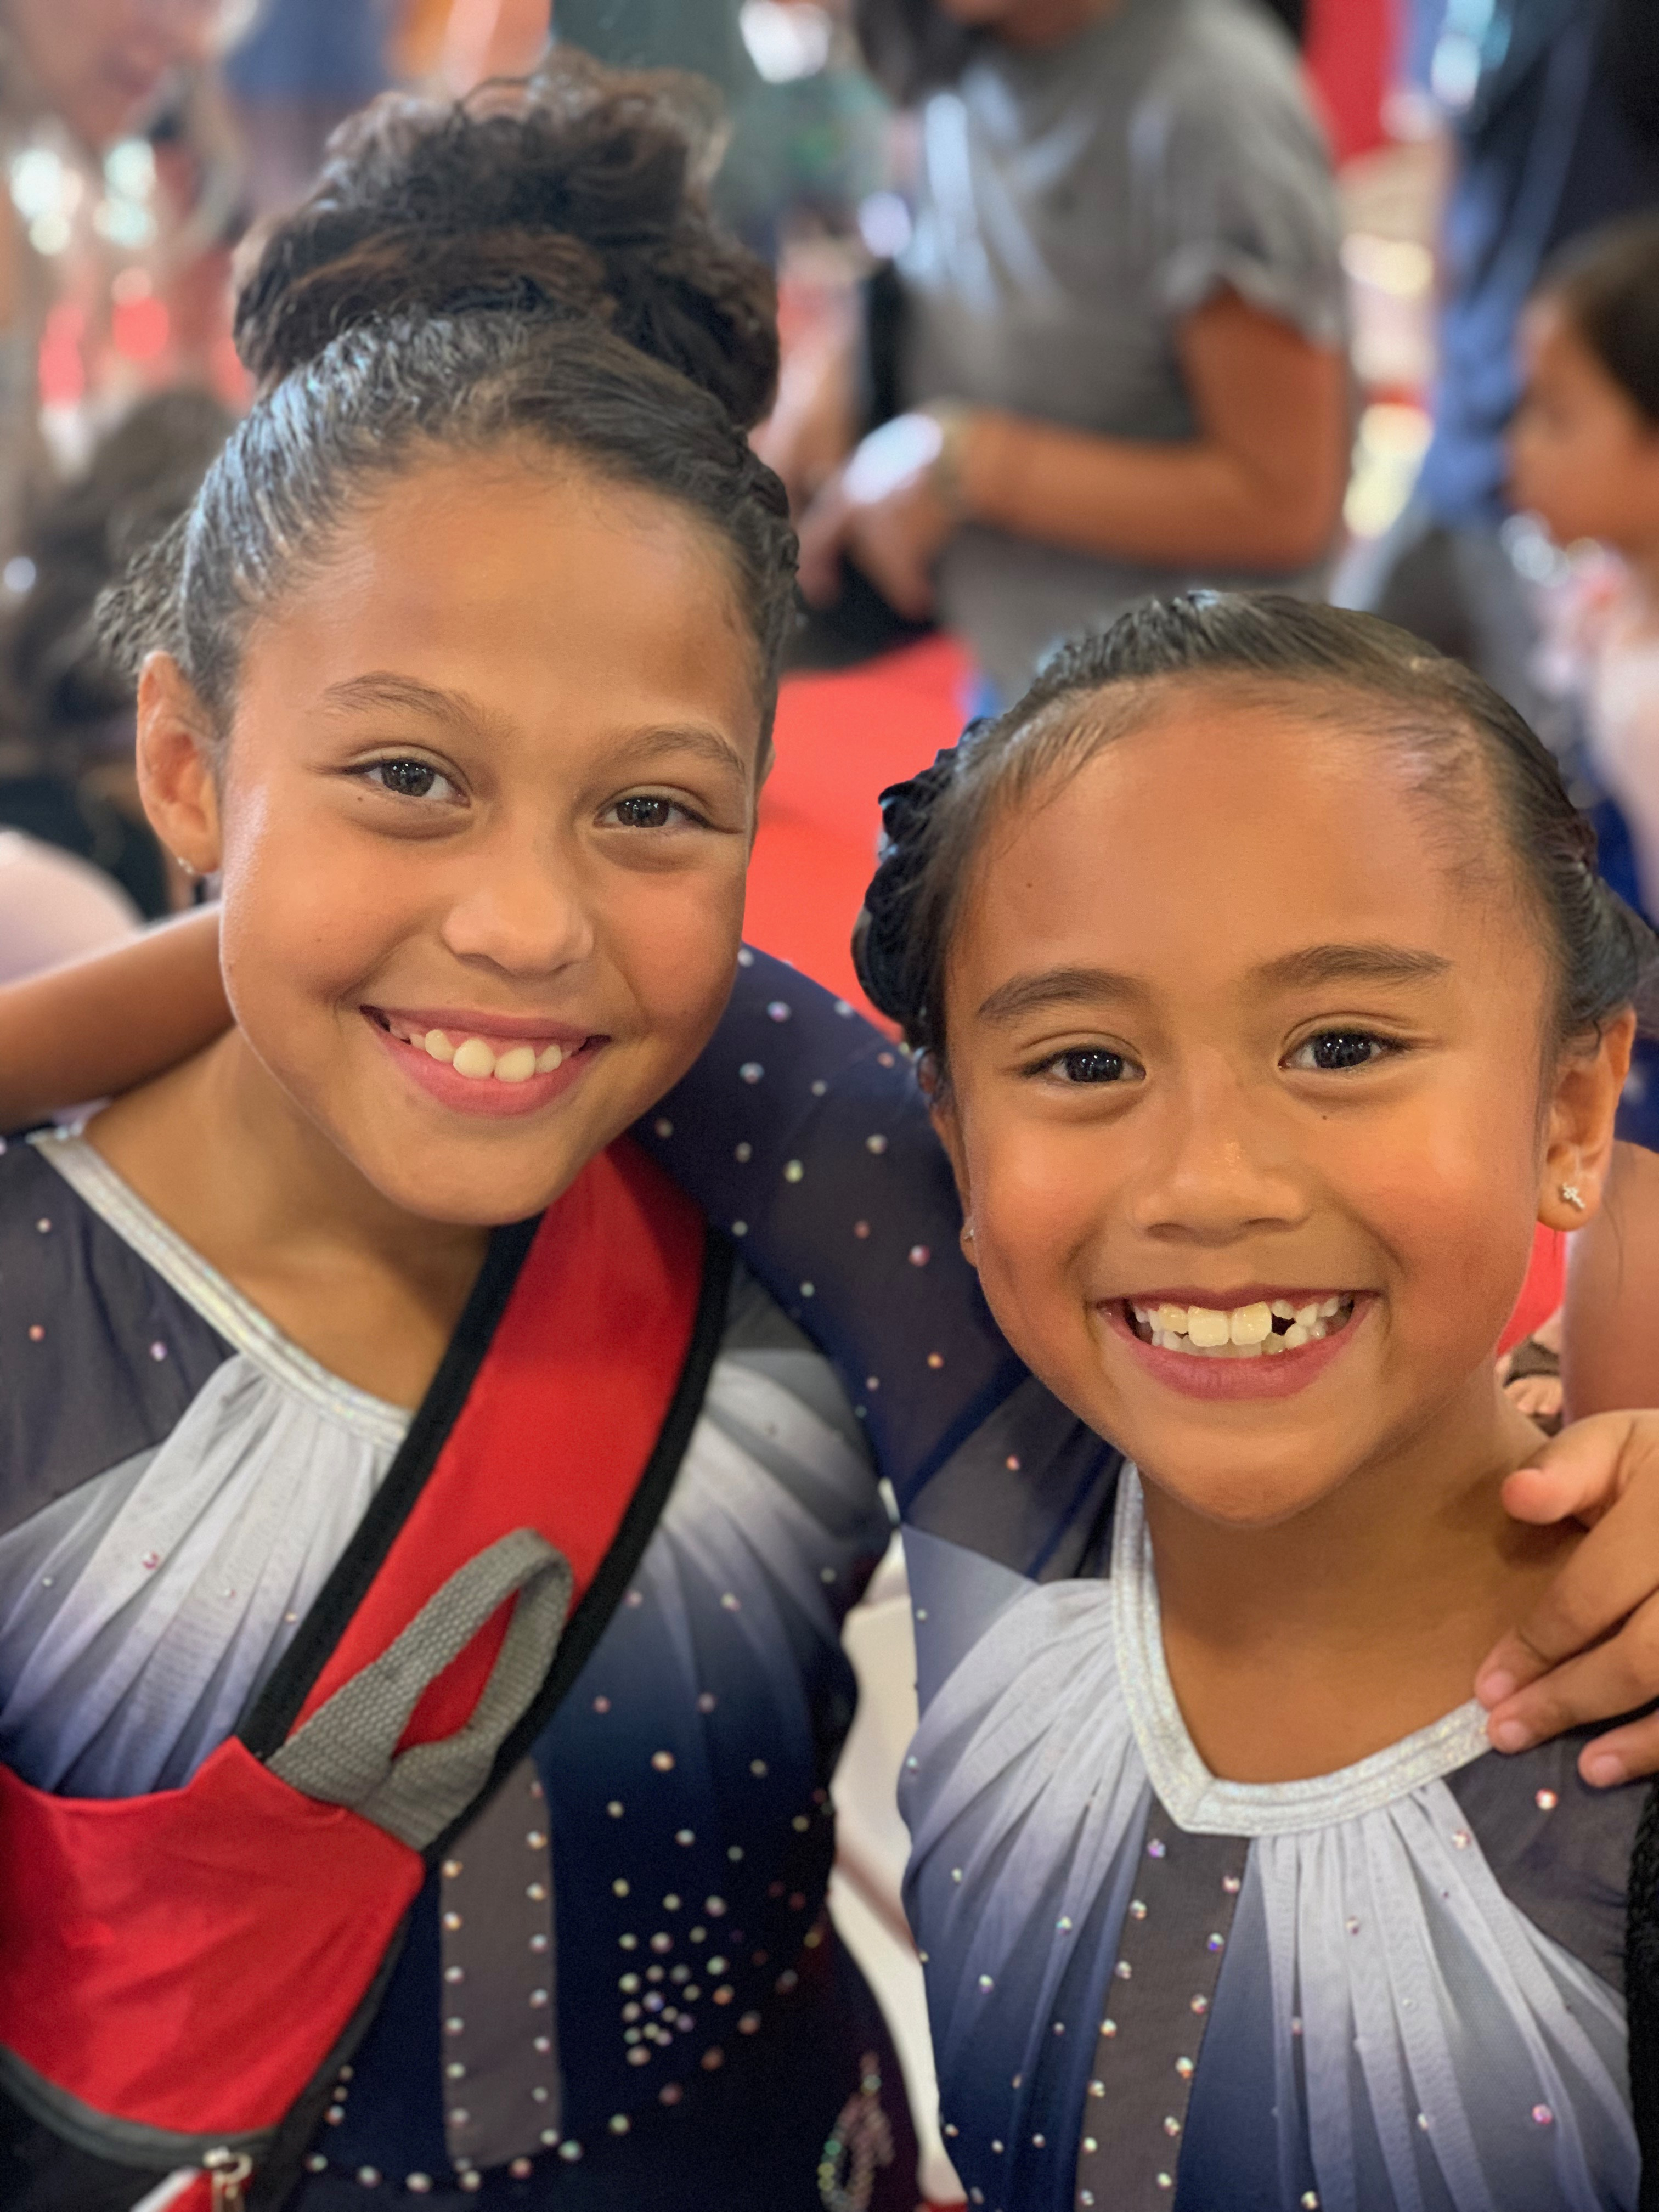 Gymnast Teammates